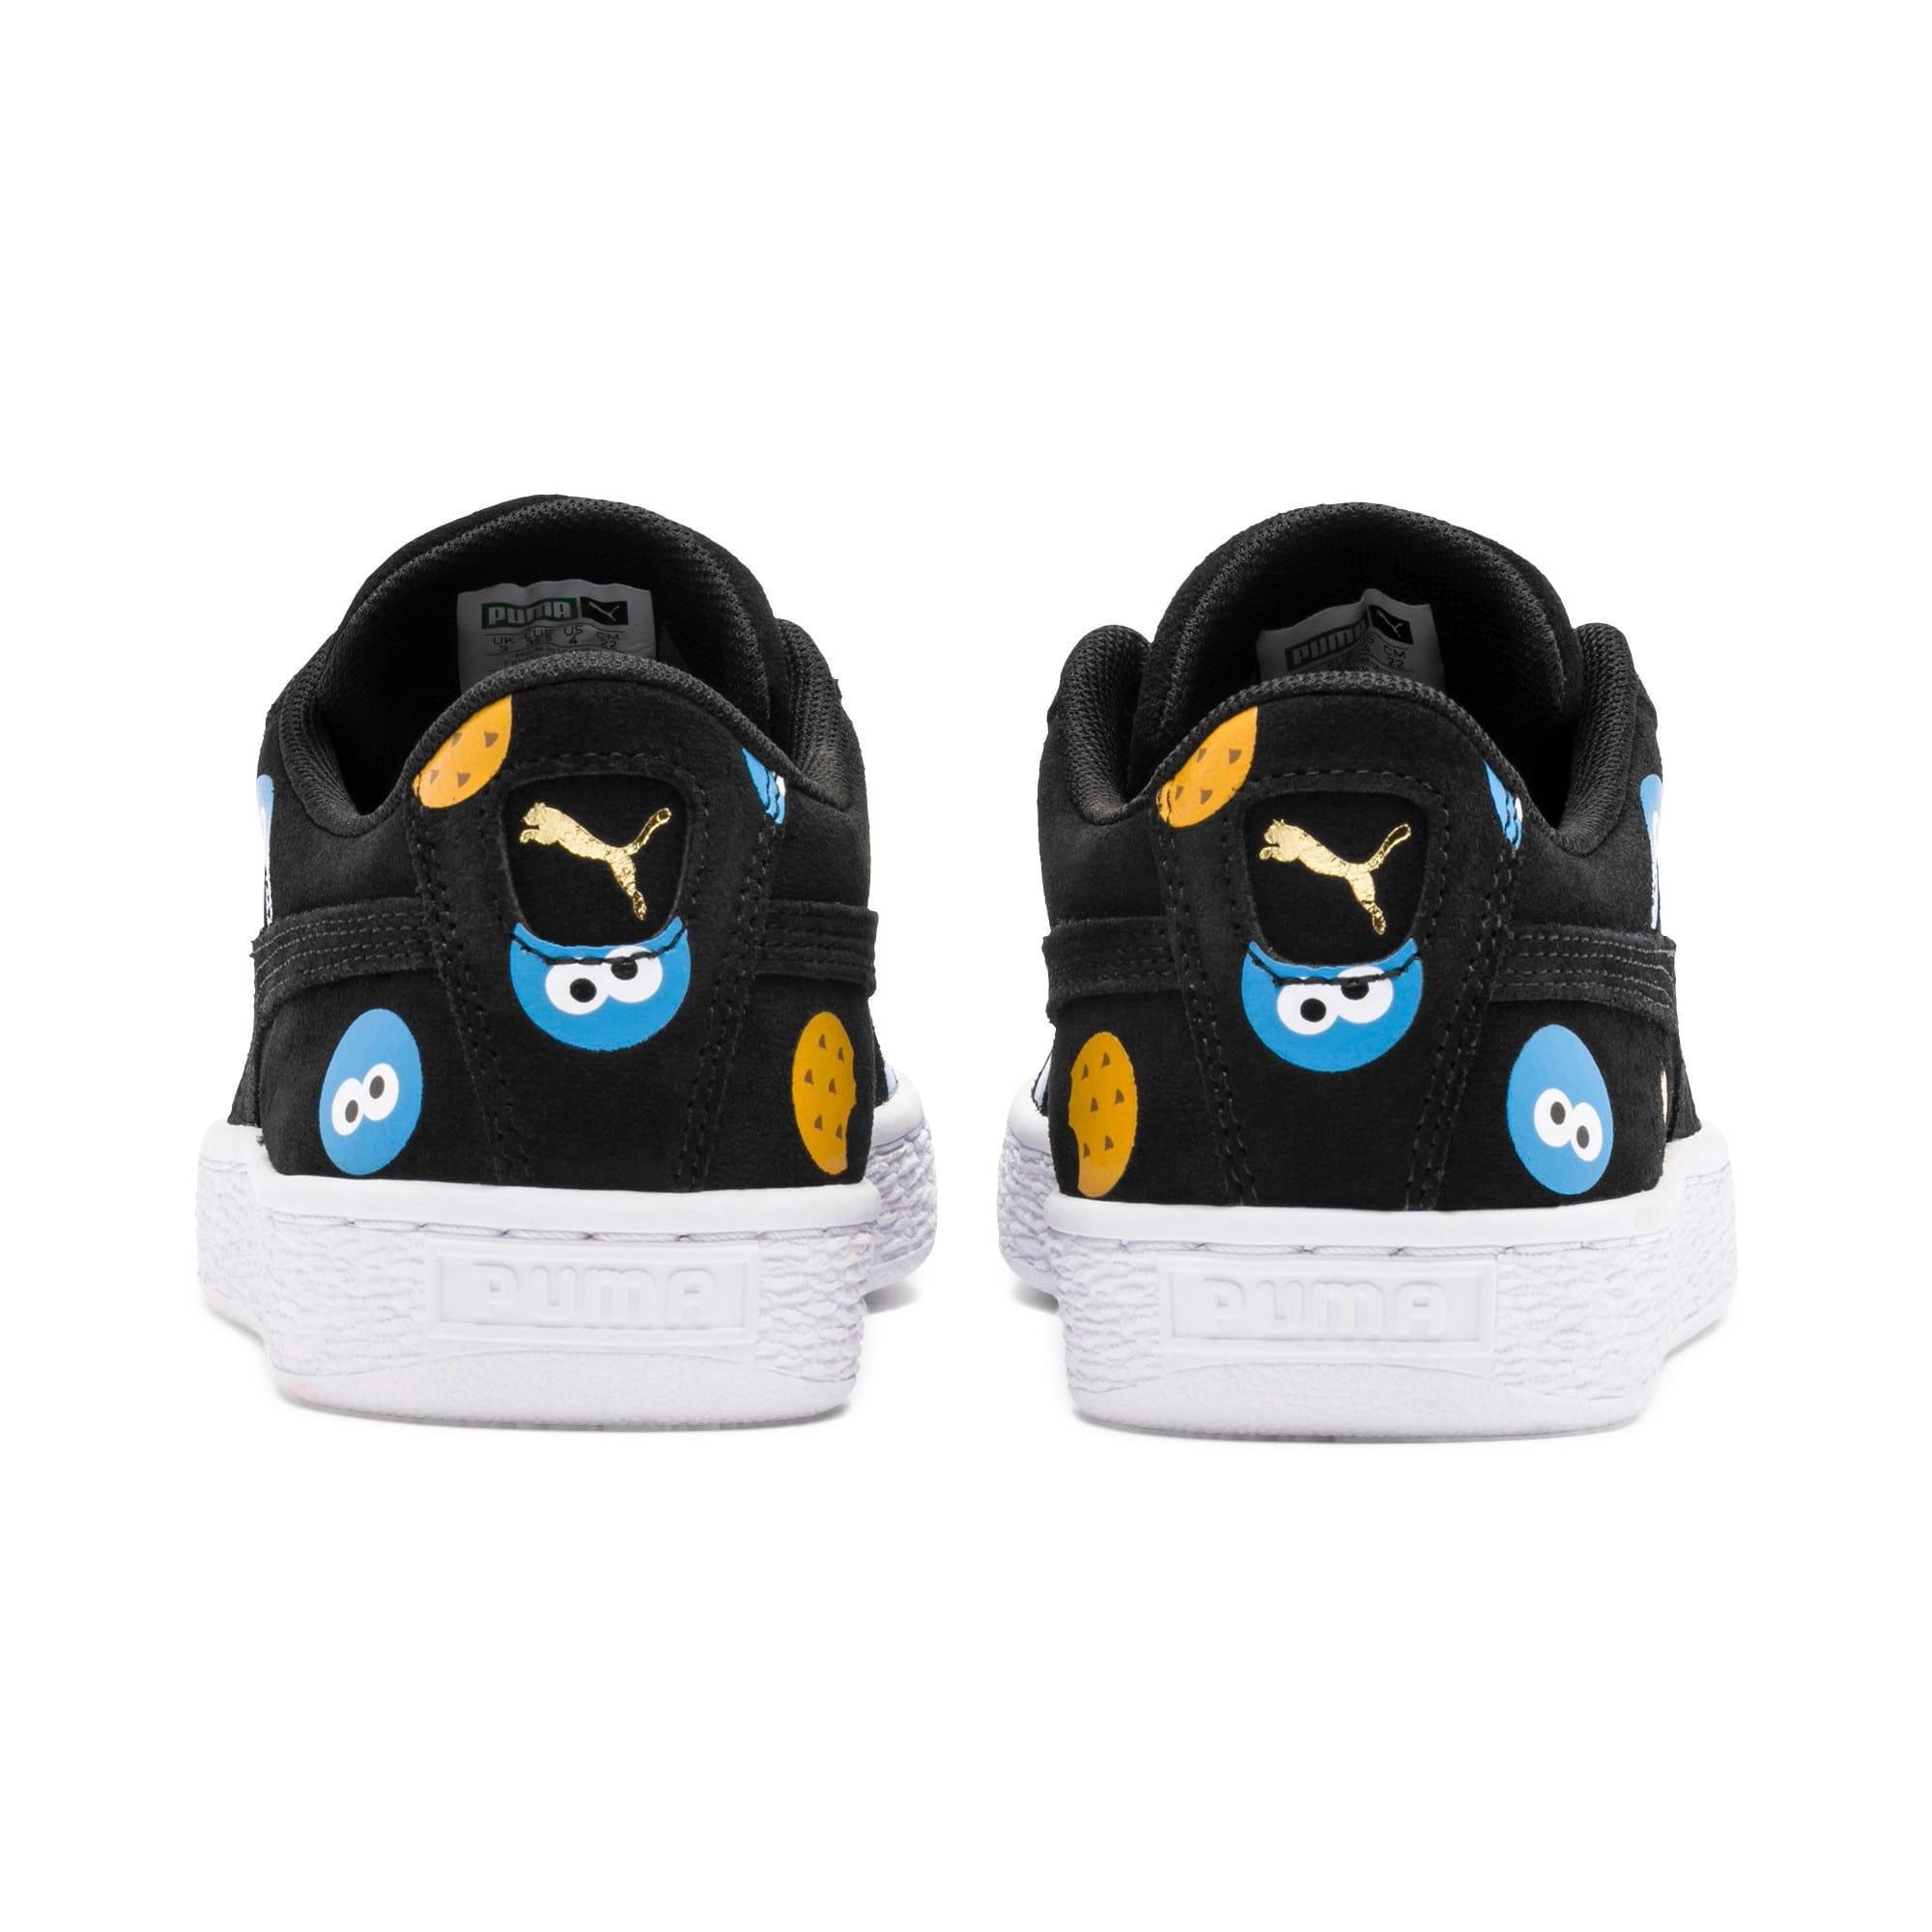 Thumbnail 3 of PUMA x SESAME STREET 50 Suede Badge Sneakers JR, Puma Black-Bleu Azur, medium